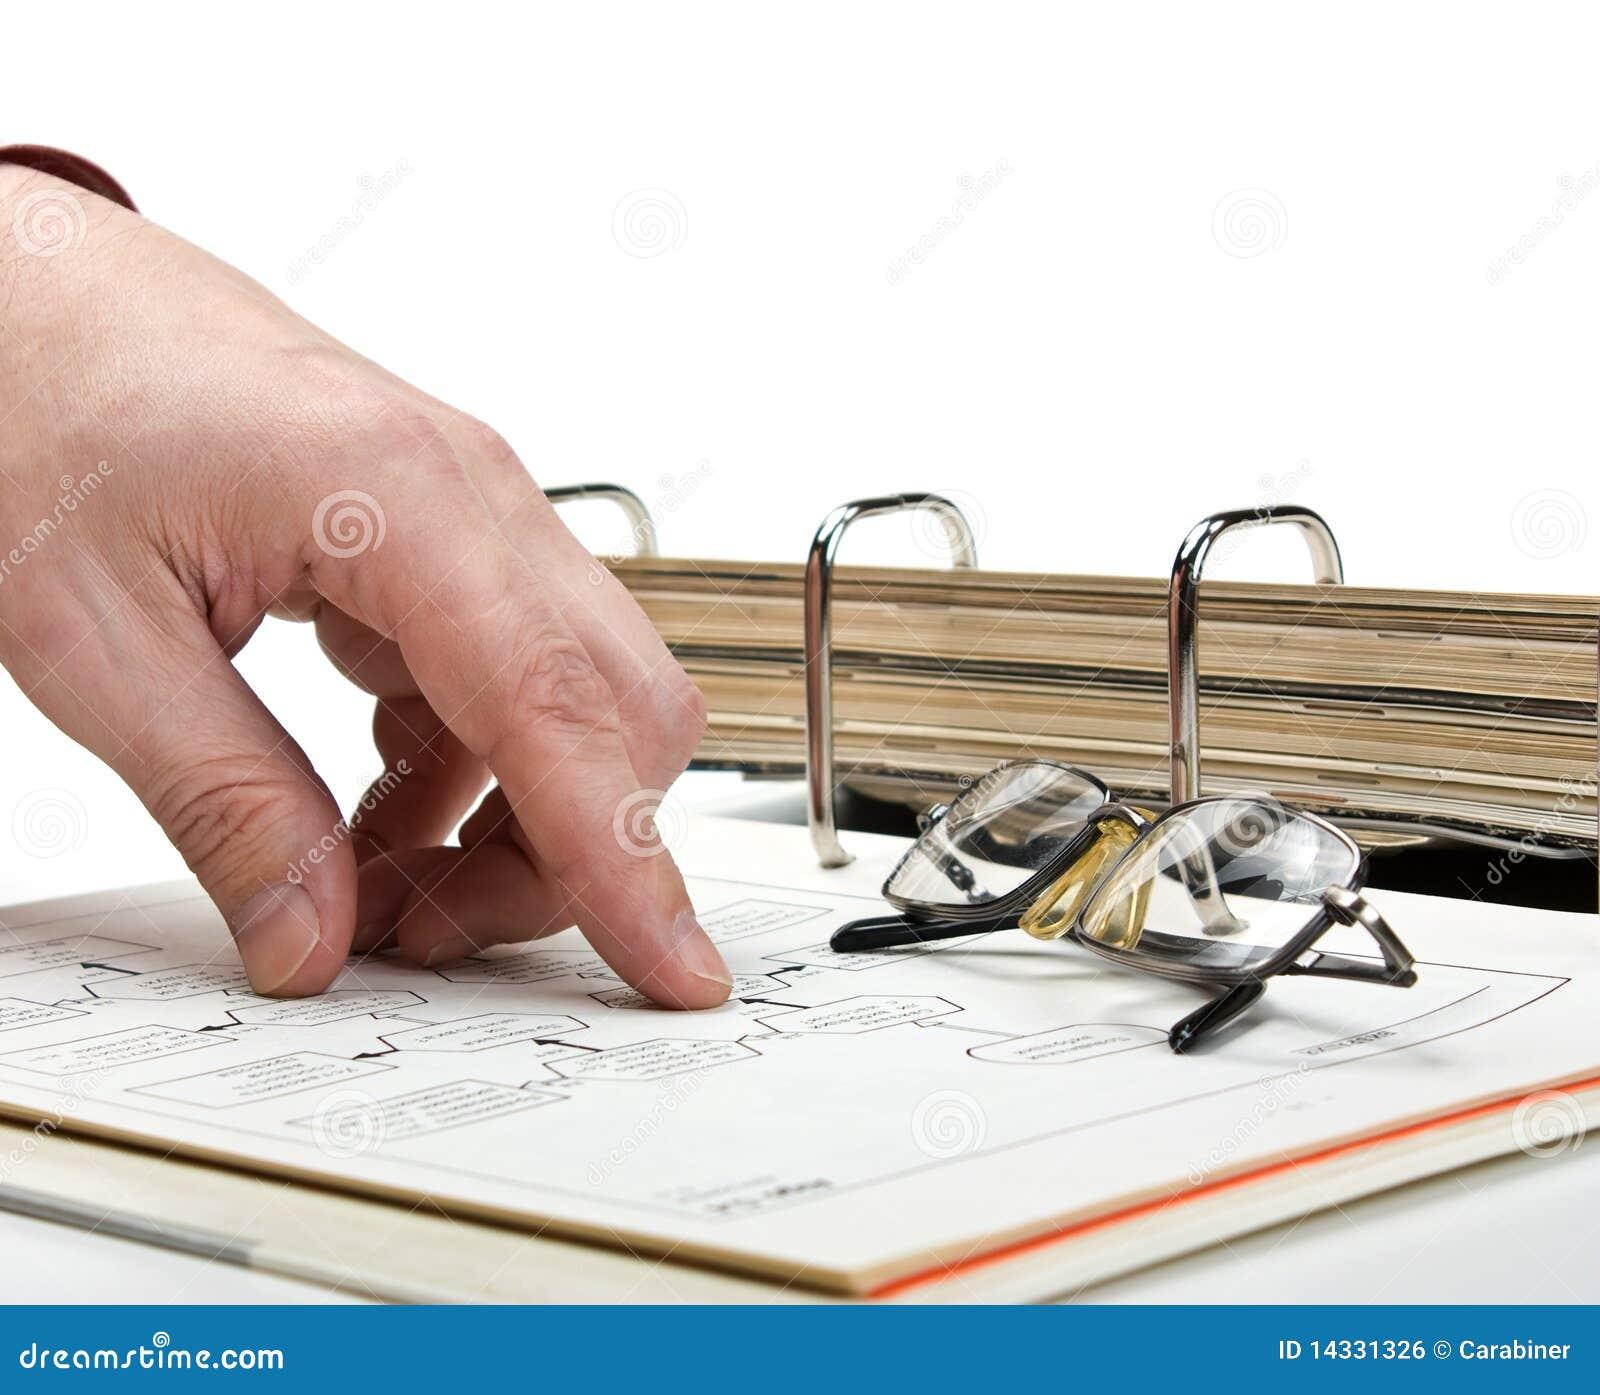 Terrific Index Finger Pointing To Diagram Stock Photo Image Of Equipment Wiring Digital Resources Bocepslowmaporg